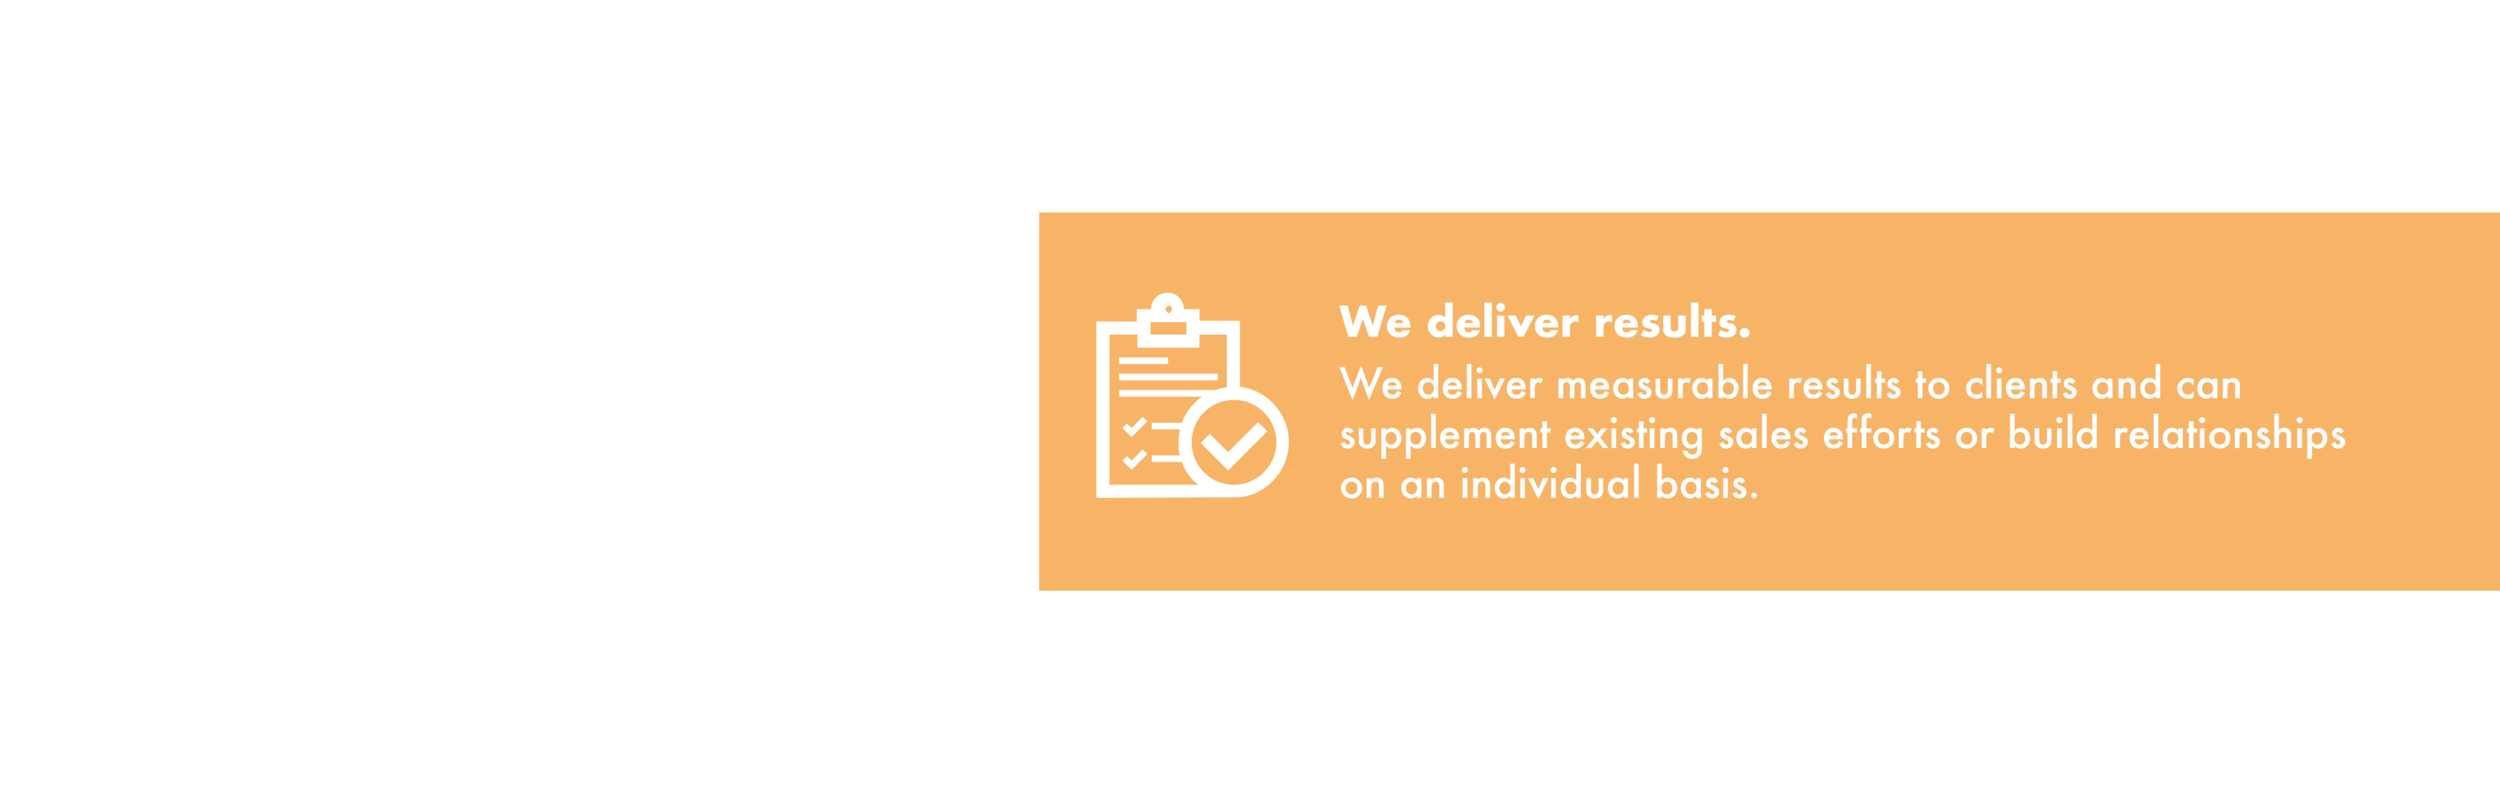 We deliver results.png